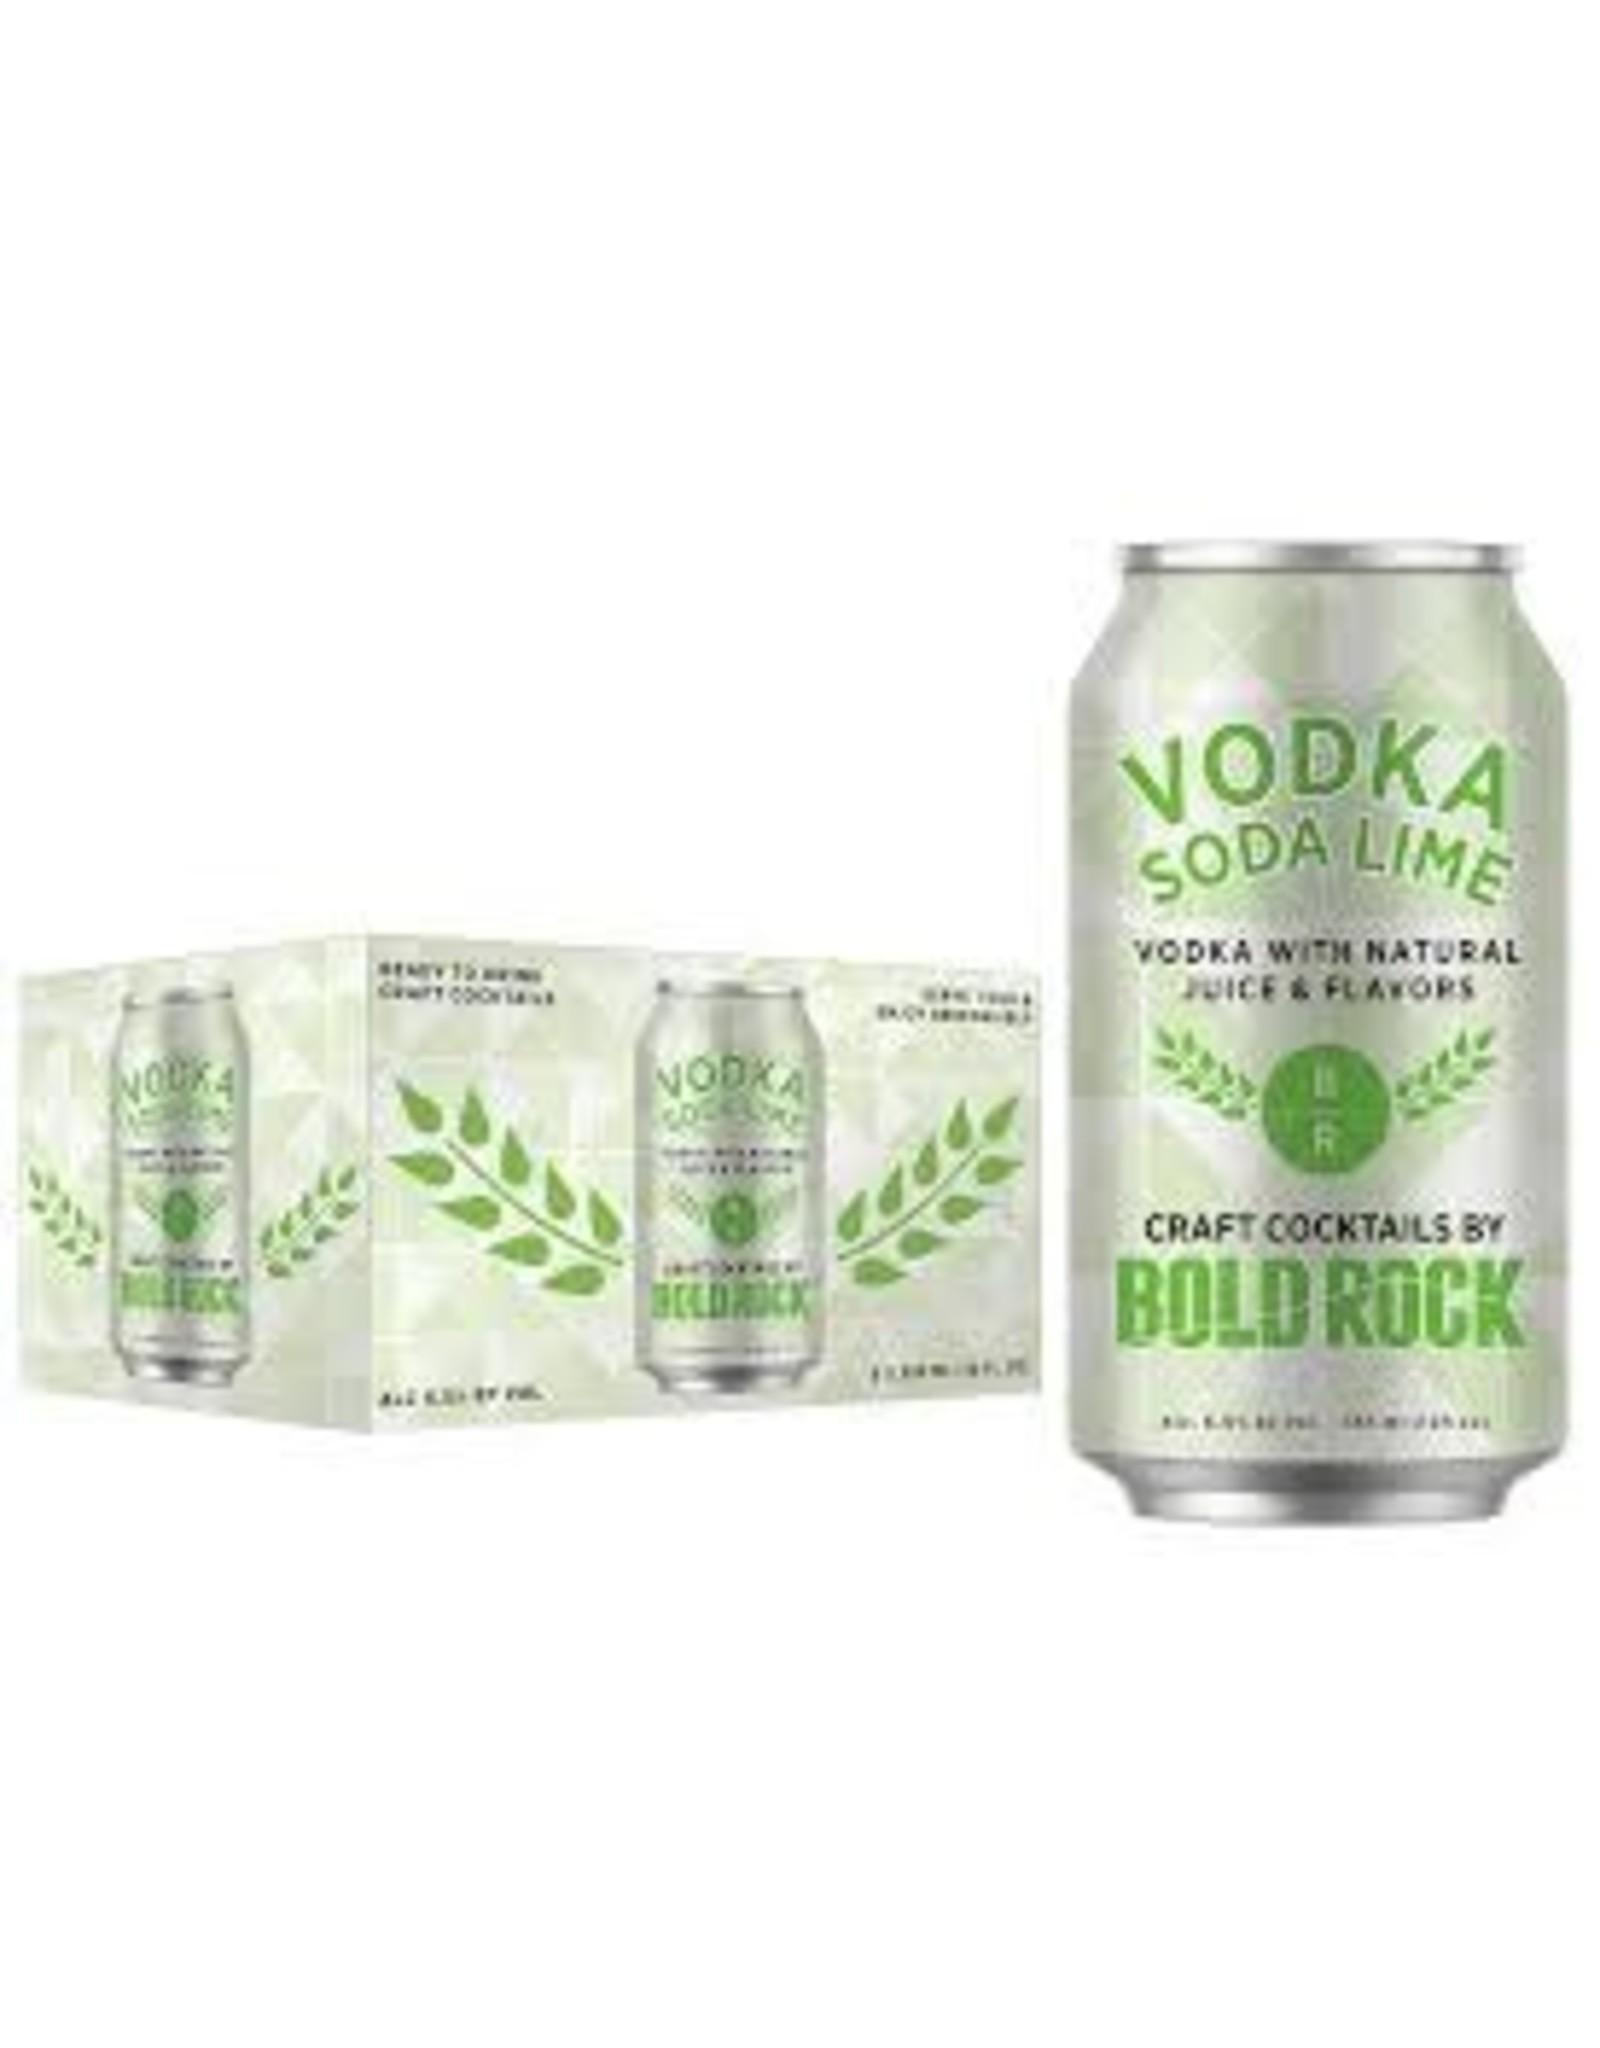 Bold Rock Bold Rock Vodka Soda Lime 6pk can